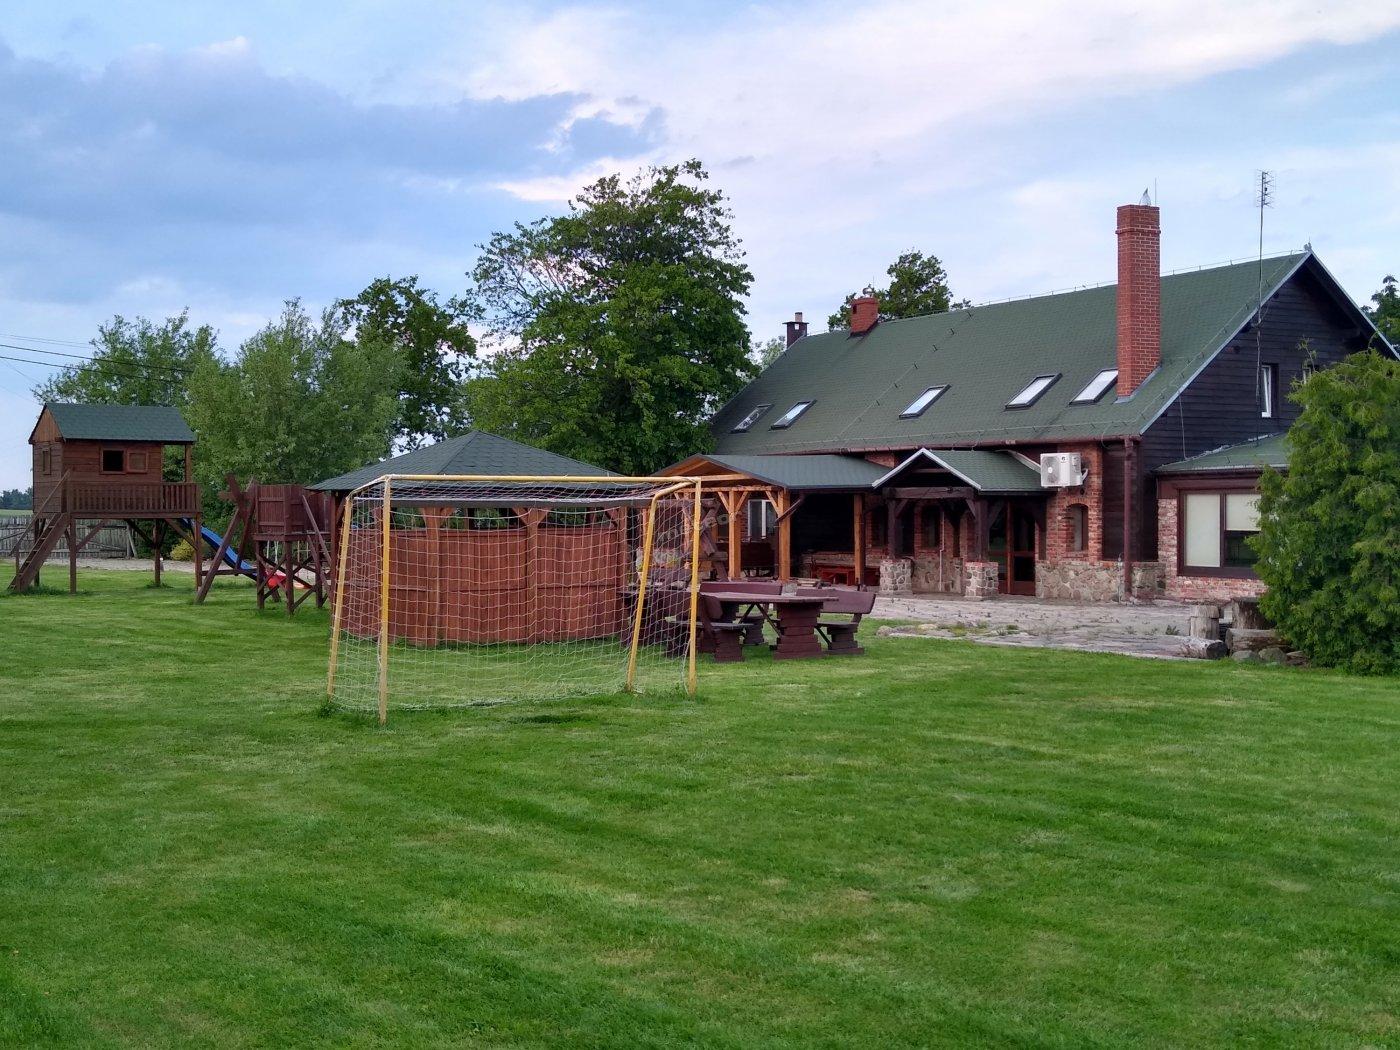 Widok z terenu rekreacyjnego na pensjonat